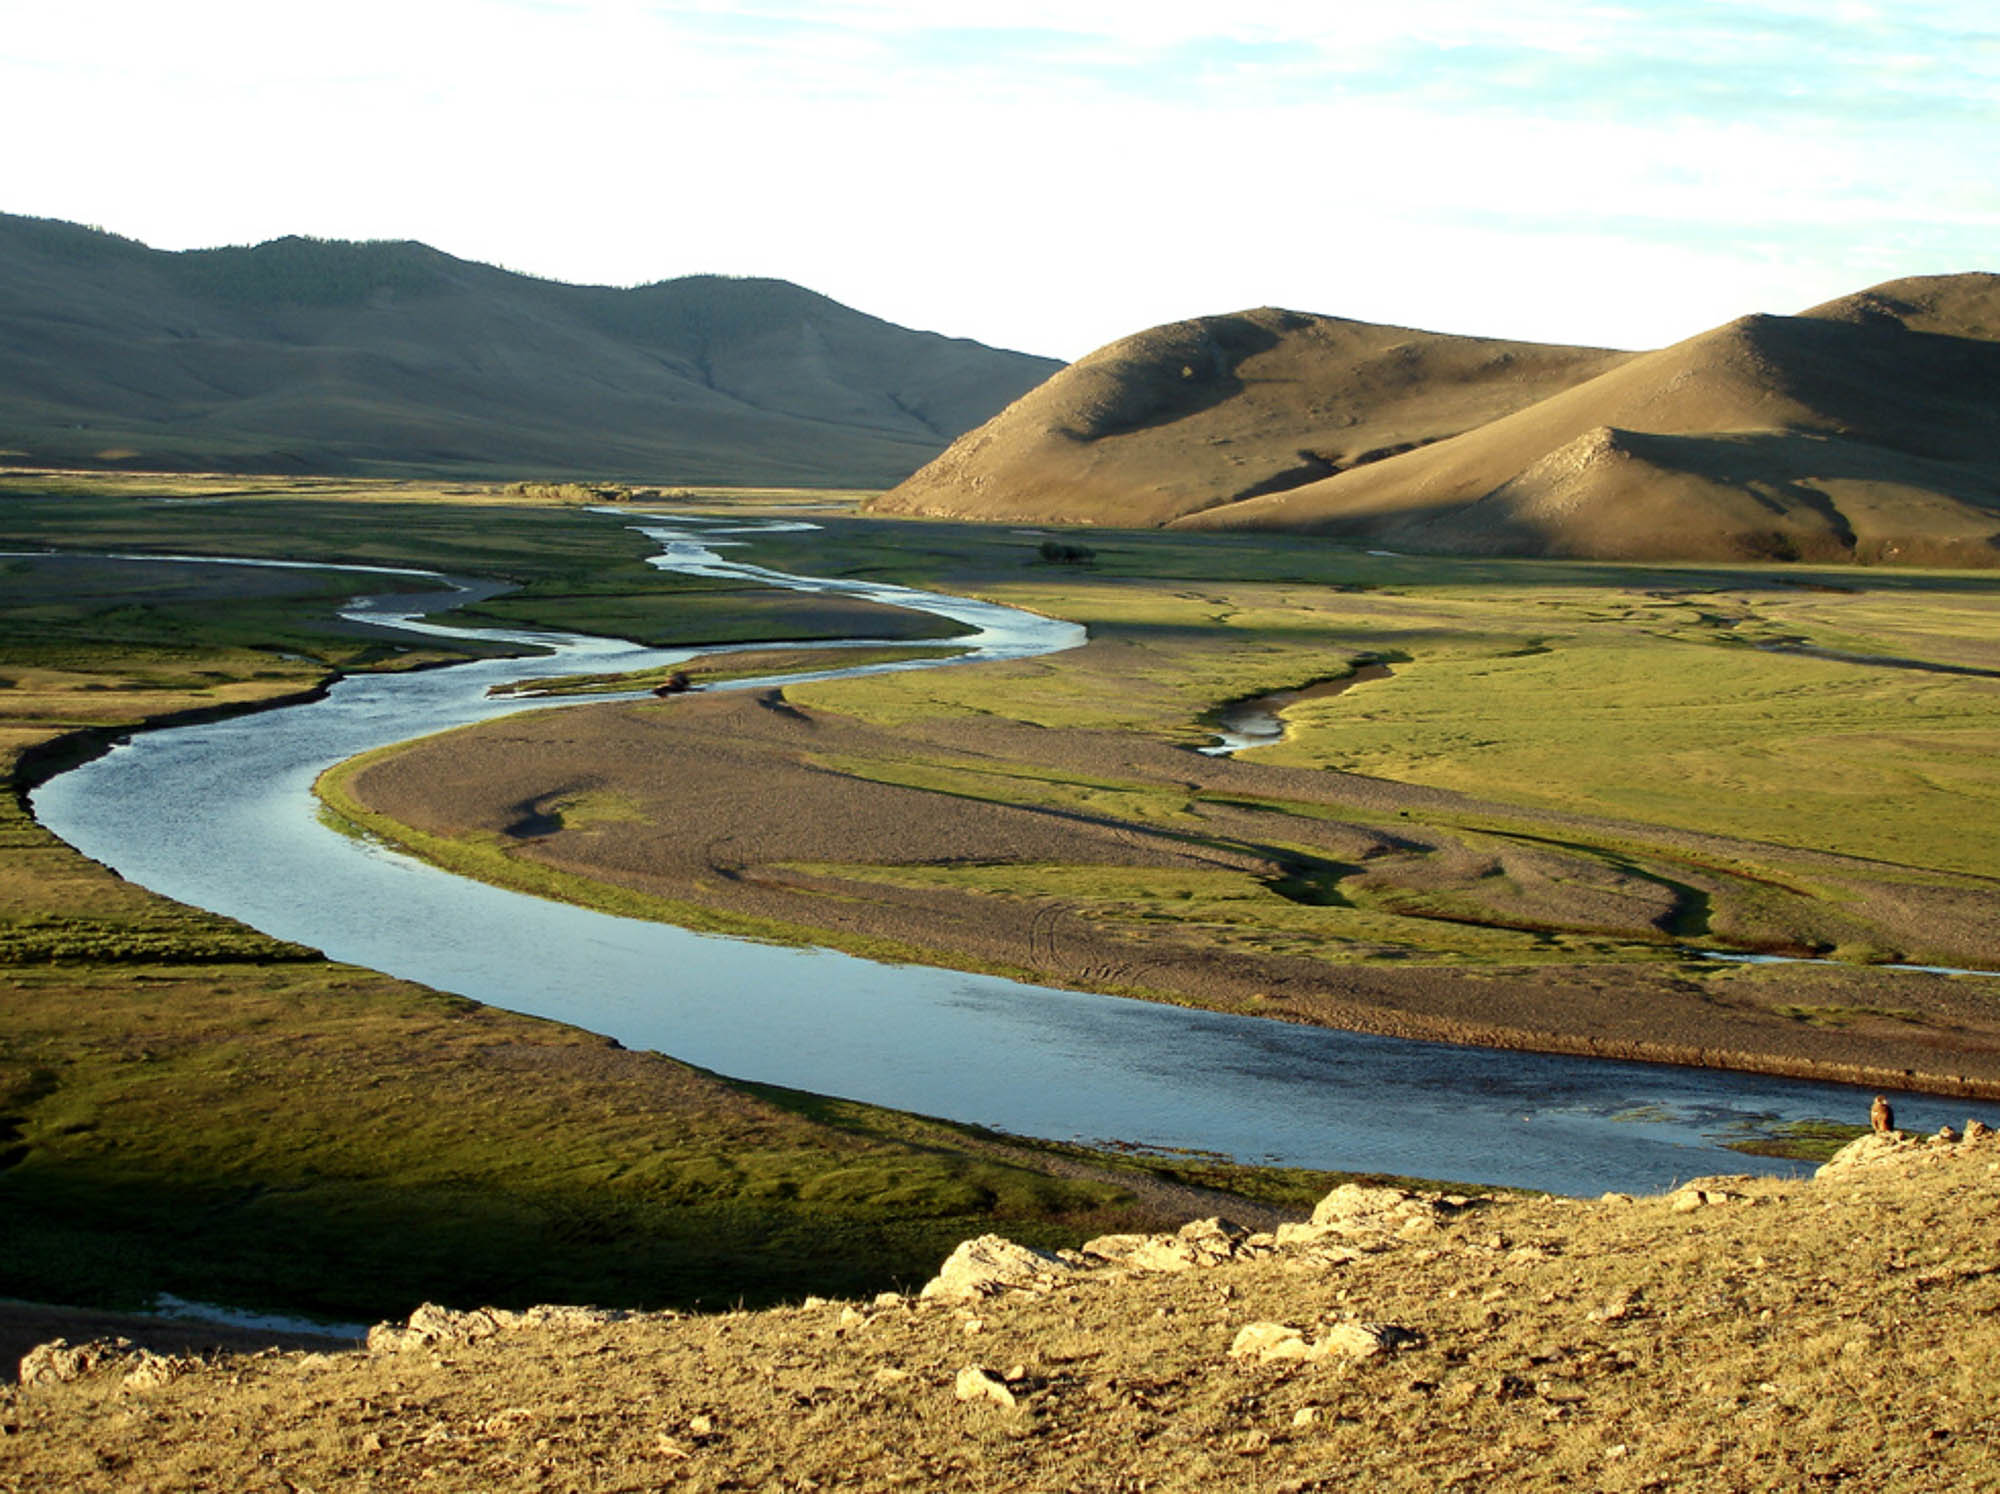 Mongolie riviere.jpg